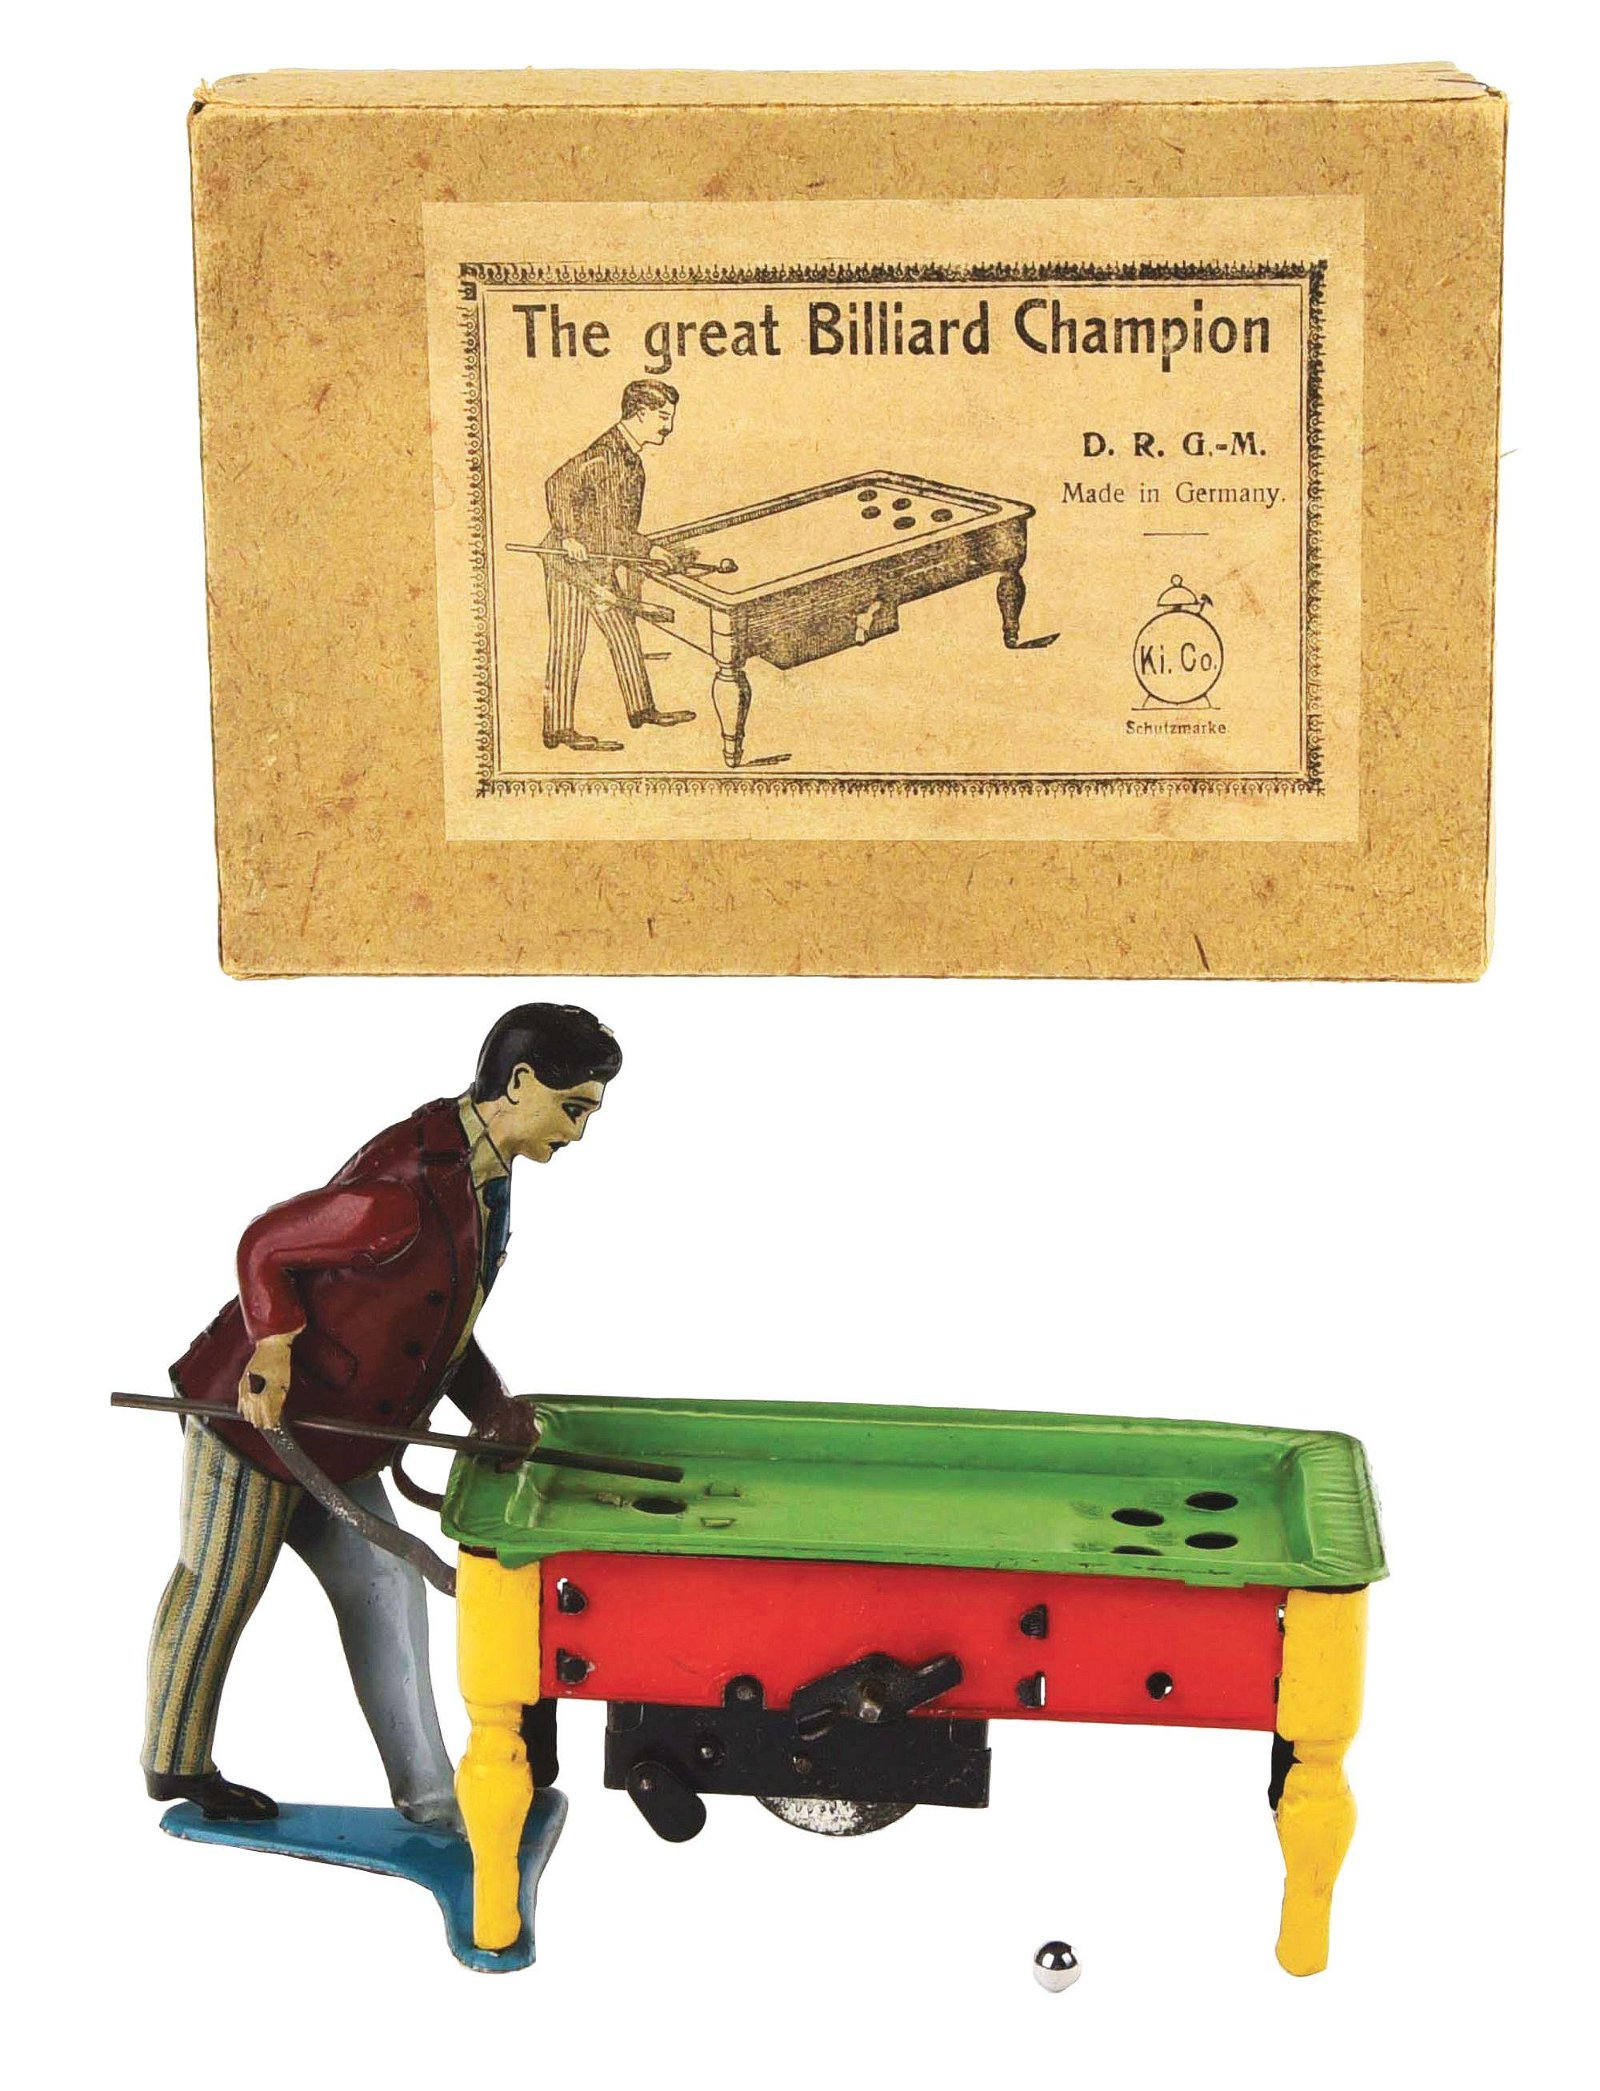 GERMAN TIN-LITHO KICO WIND-UP BILLIARD TOY.